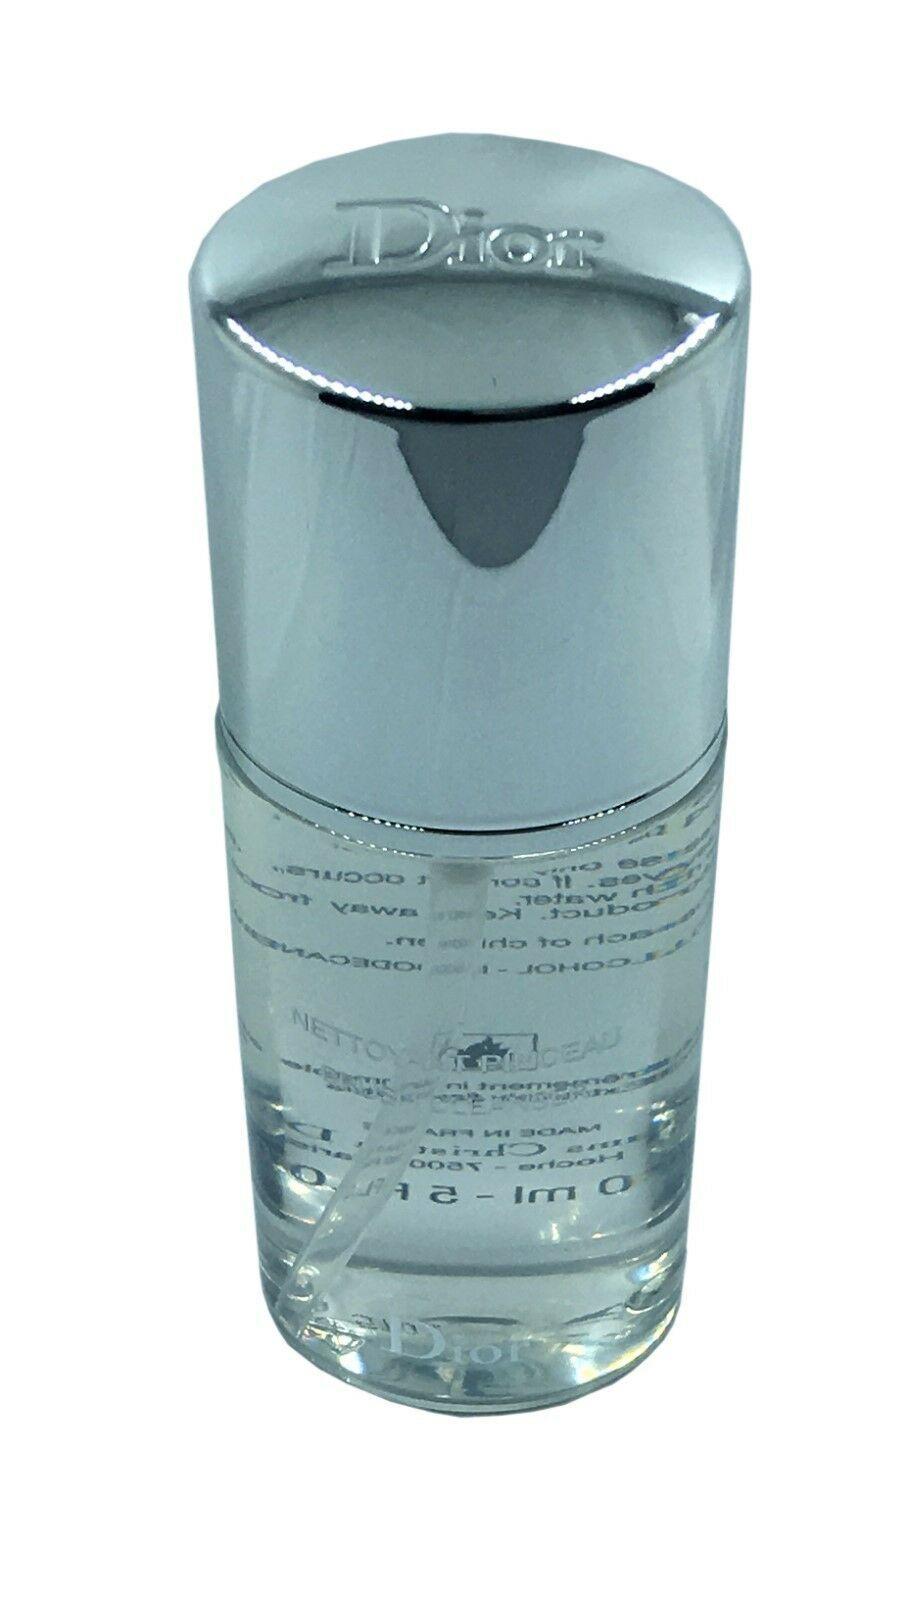 DIOR BACKSTAGE BRUSHES BRUSH CLEANSER 150 ML/5 FL.OZ. NIB-F099483000 - $18.81